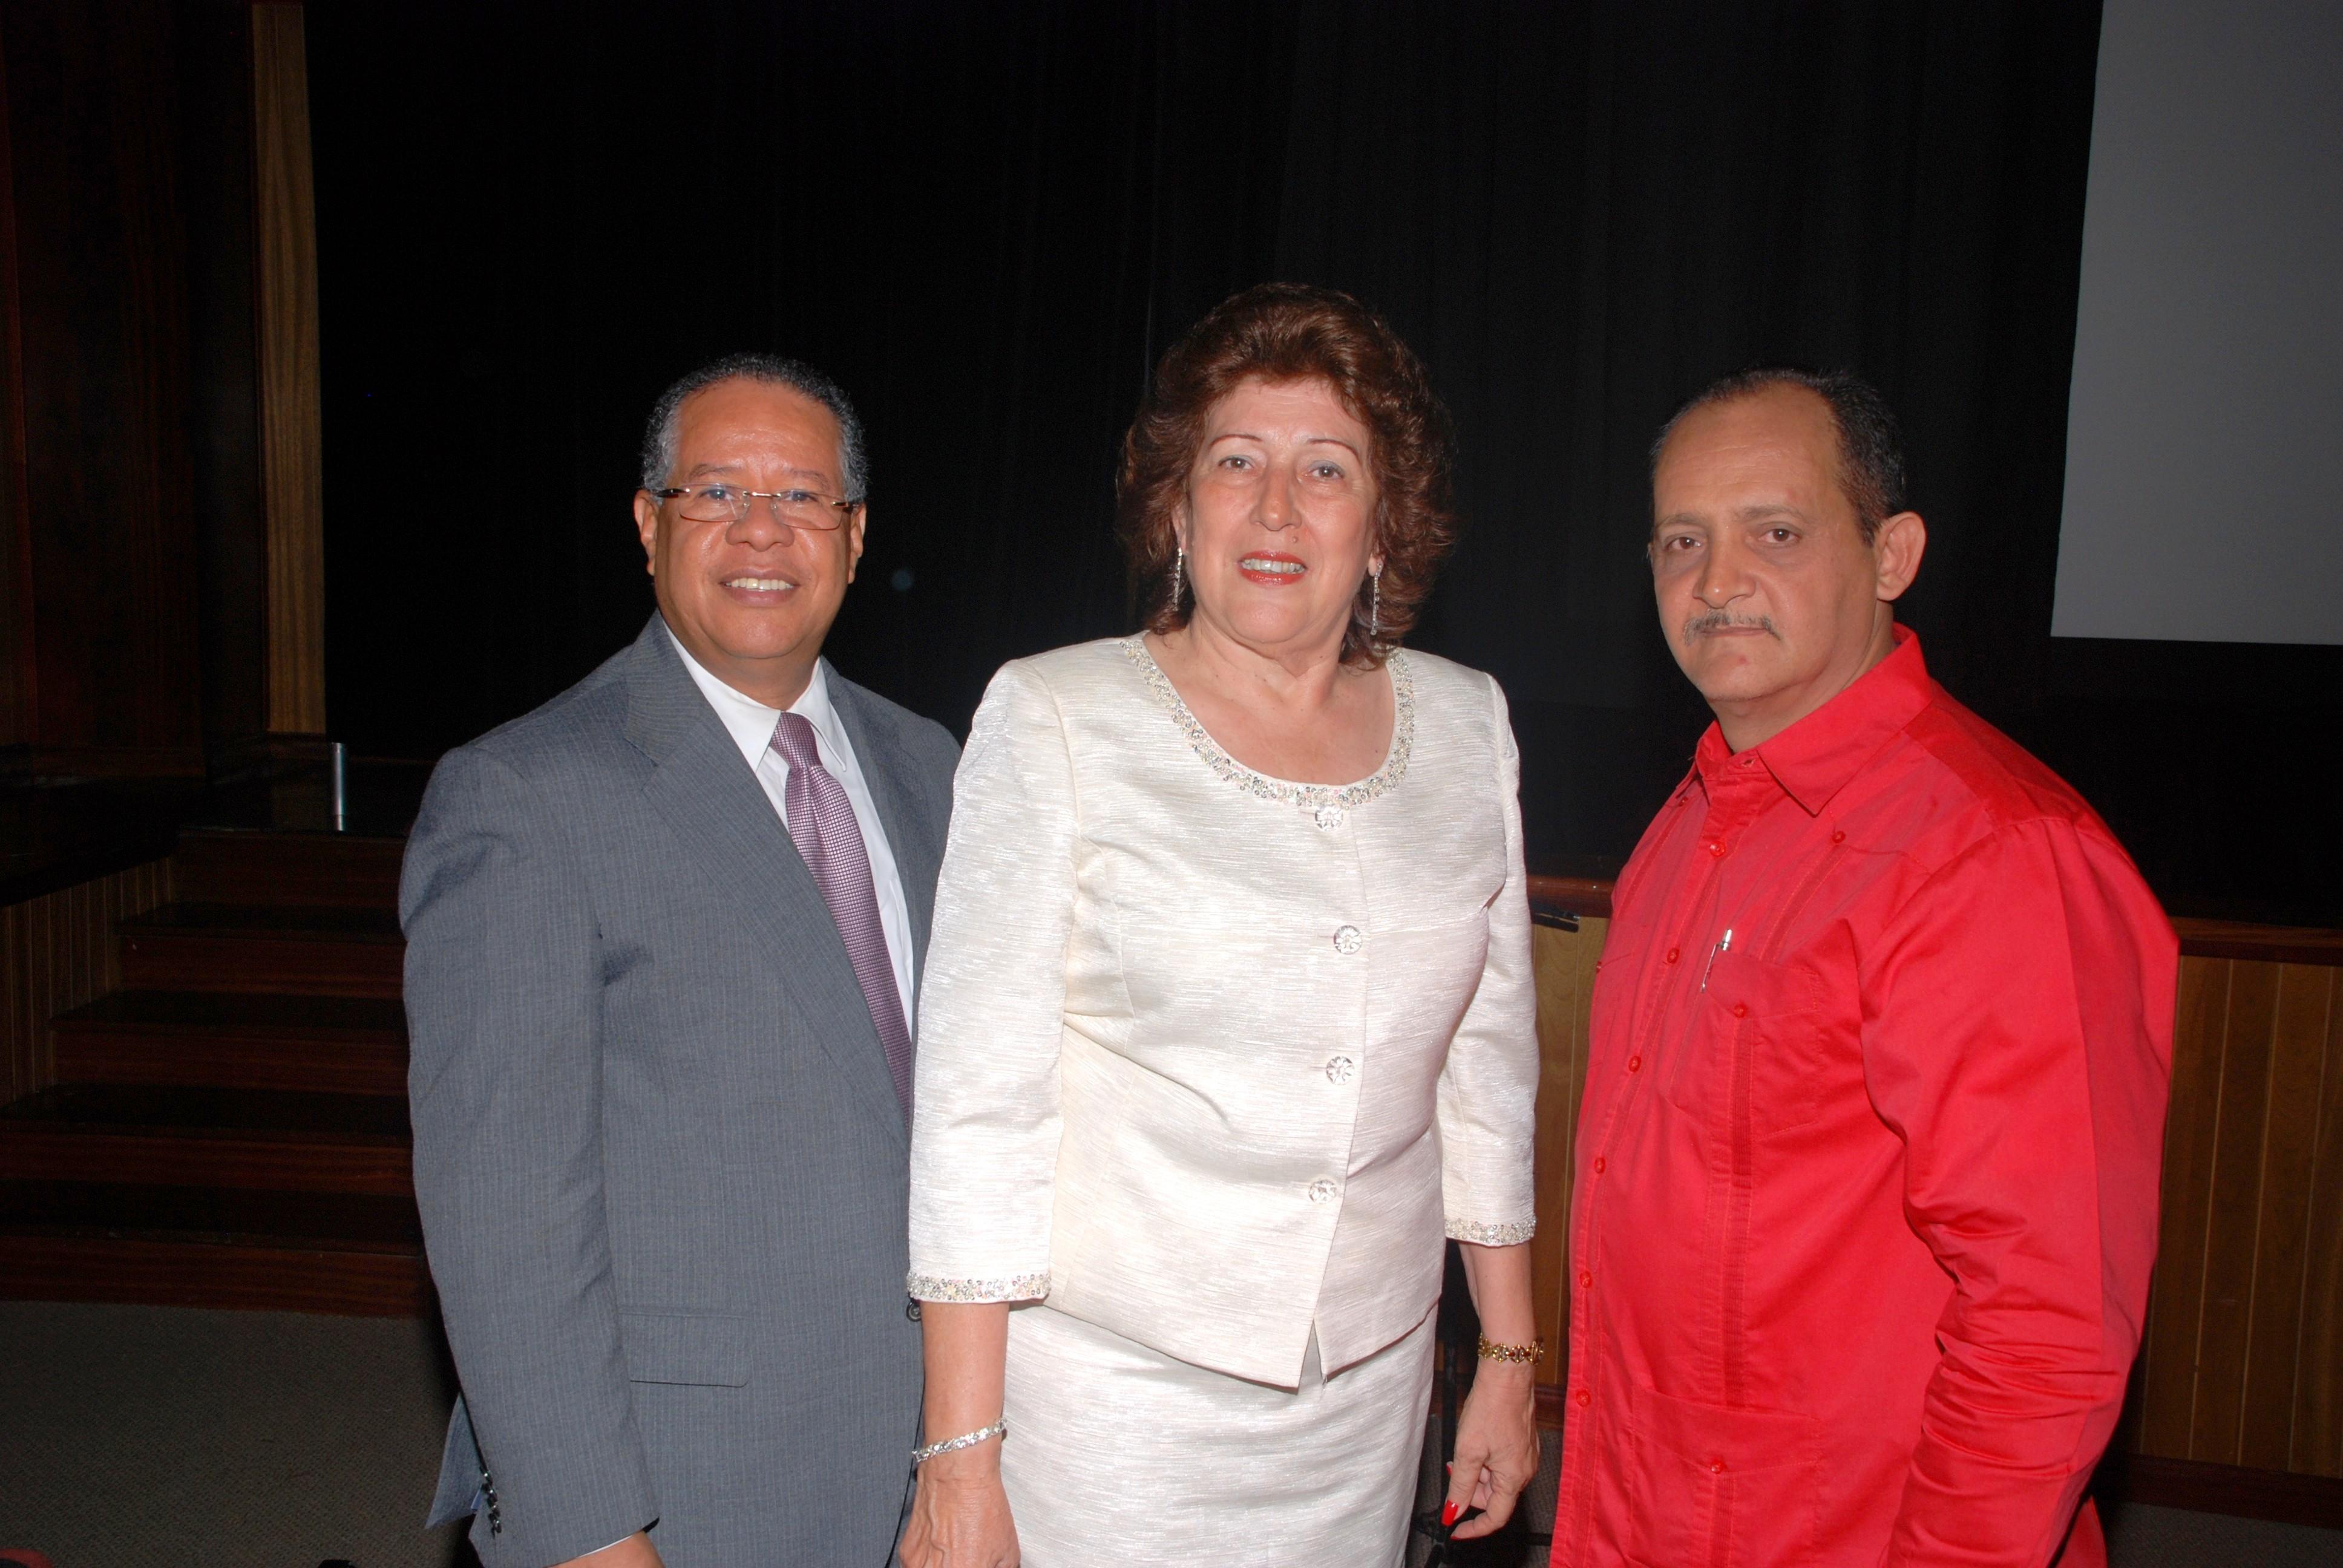 POP-cura-Apertura-Blanca nieves_01.Sr Omar Liriano (FGDE),Sra Erudania Llibre(gobernadora de pop),Sr Roman Racero (director cura)